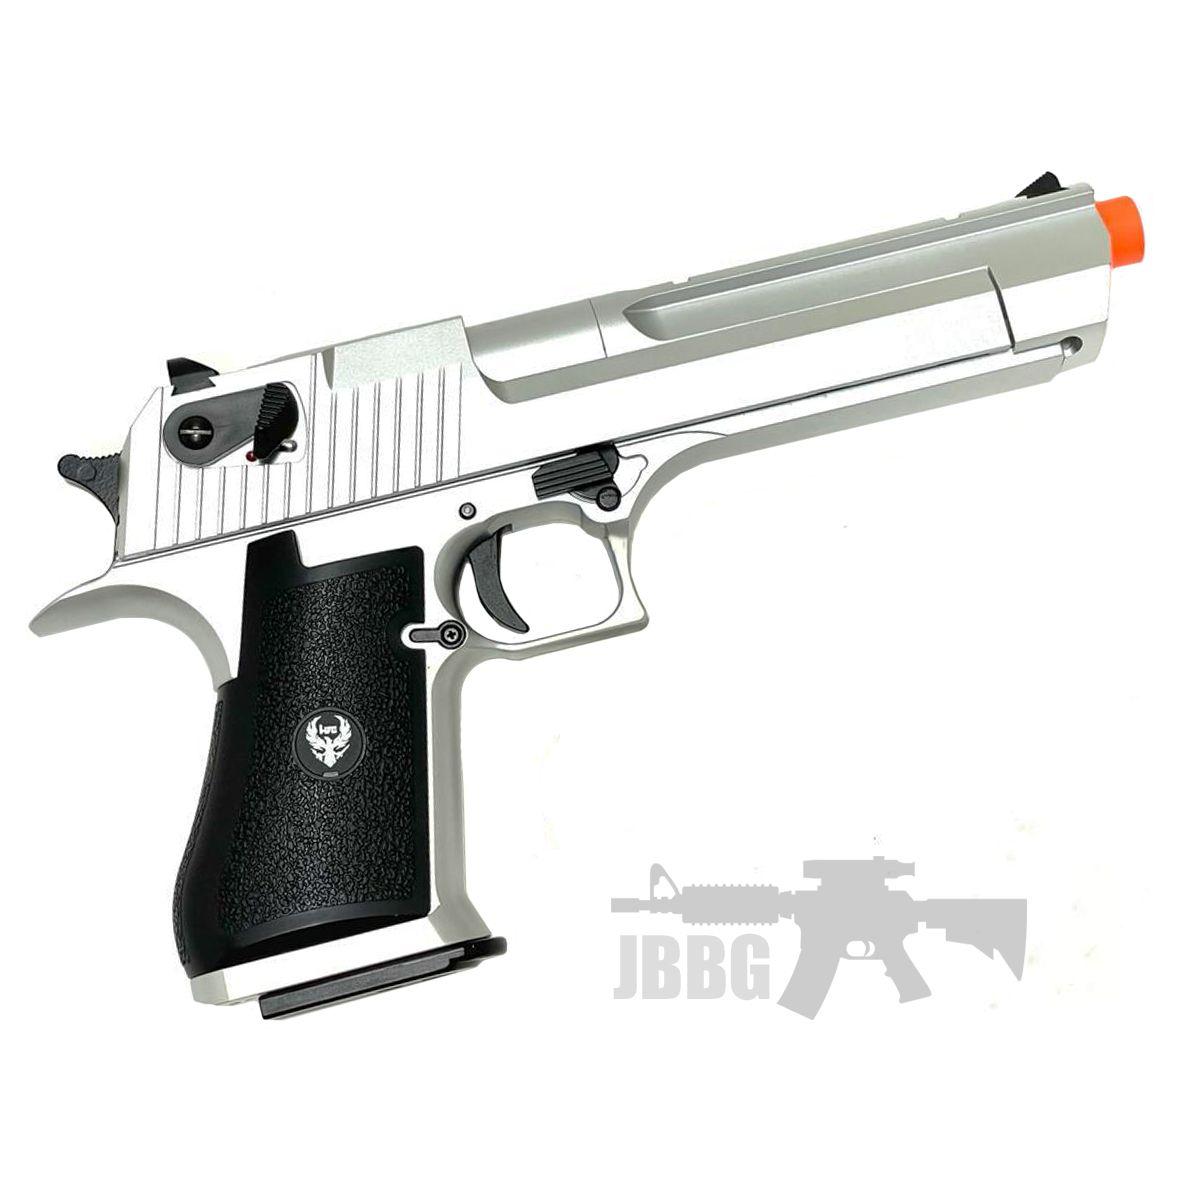 HFC HG195 Desert Eagle Gas Powered Blowback Airsoft Pistol Silver